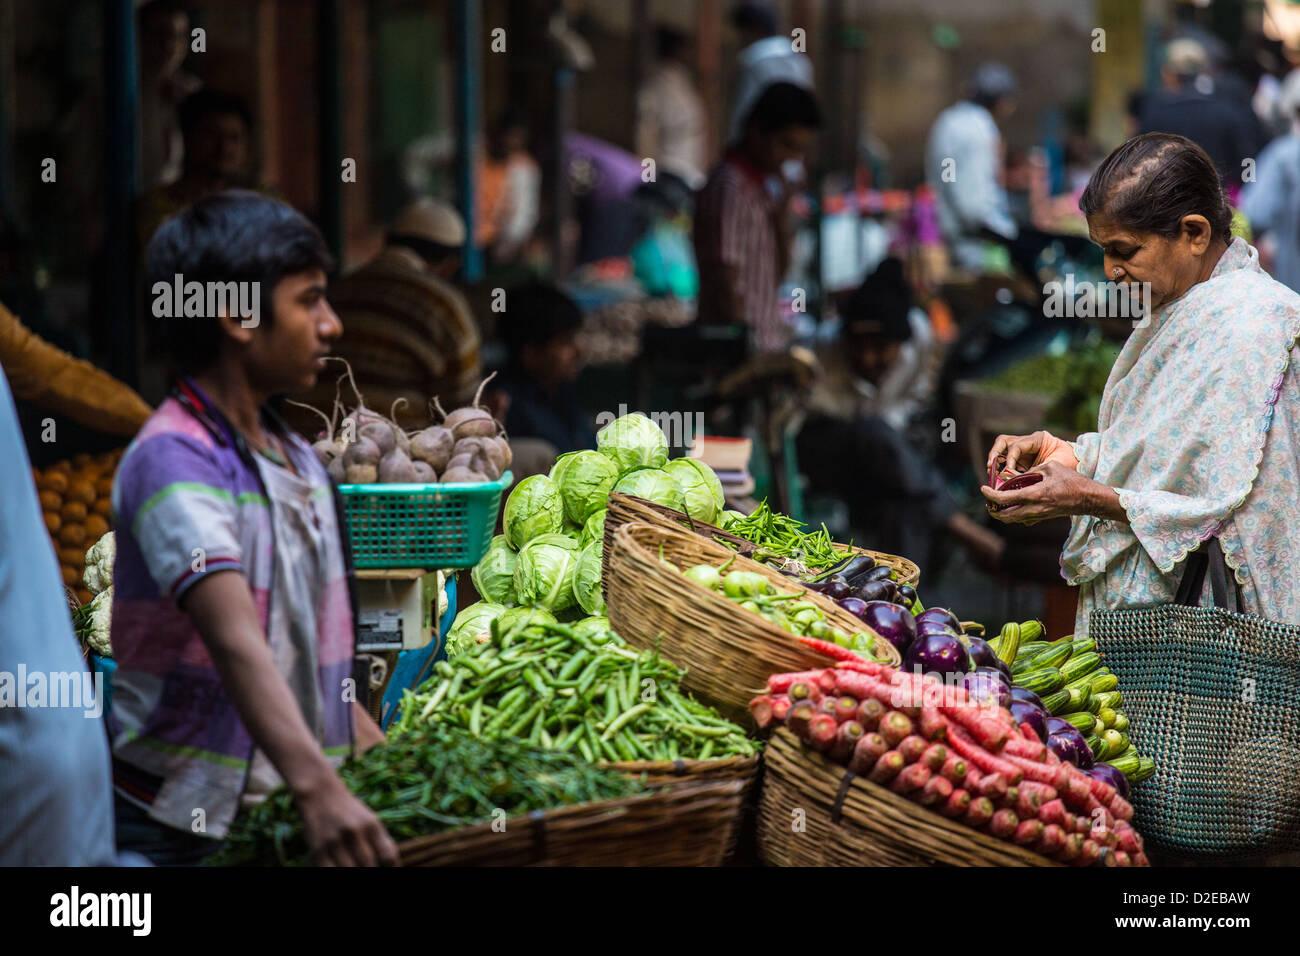 Vegetable market, Ahmedabad, Gujarat, India - Stock Image